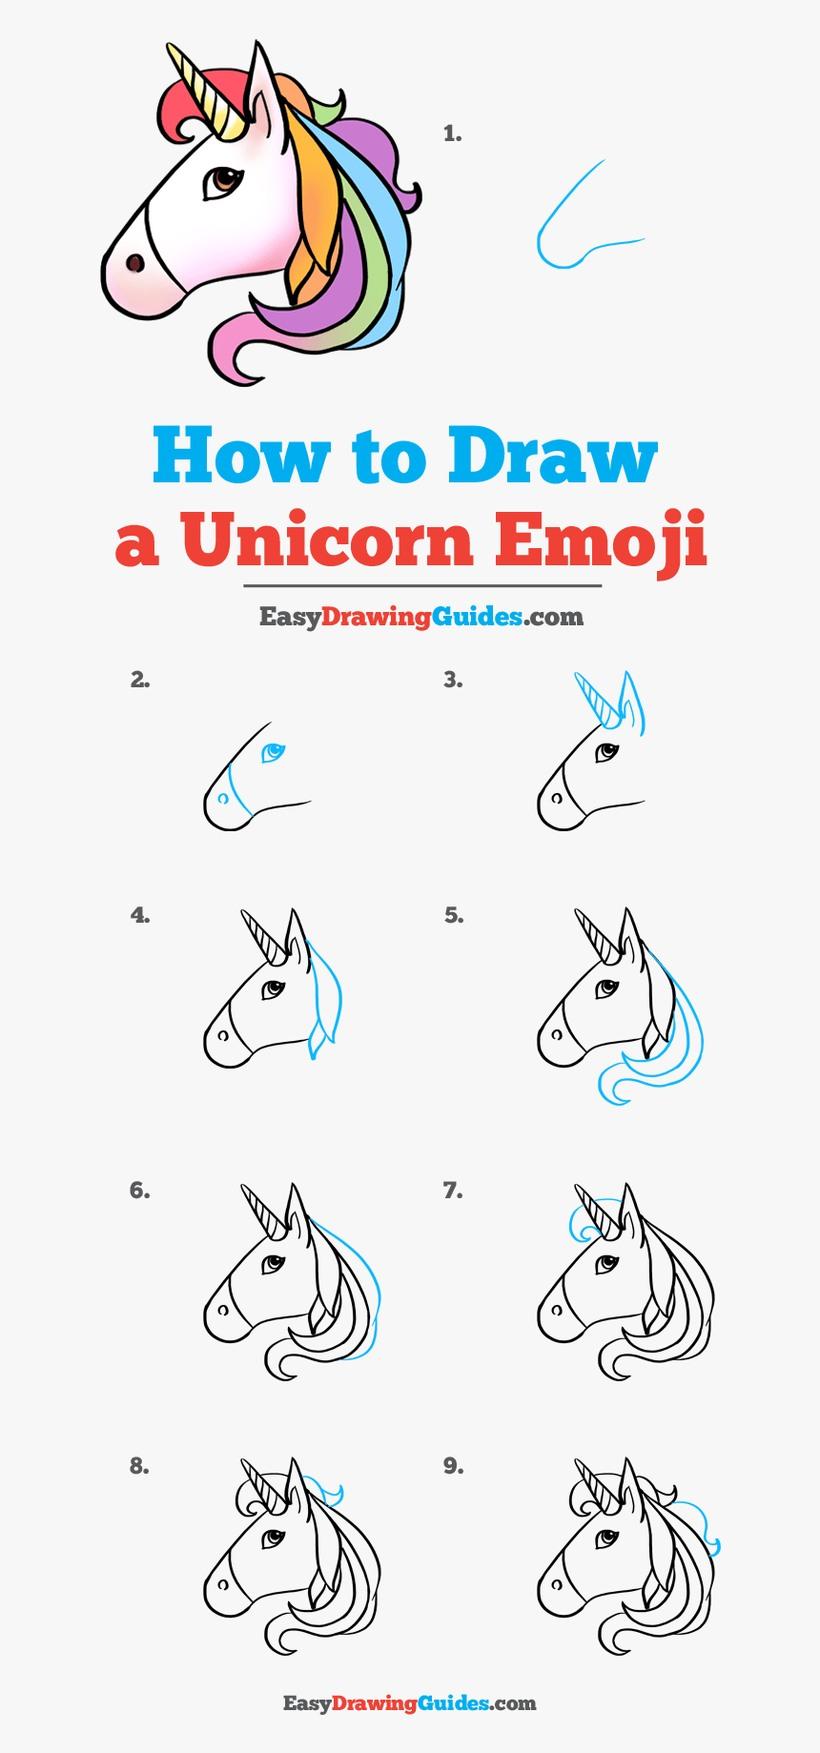 dibujos fáciles de emoji de unicornio  paso a paso